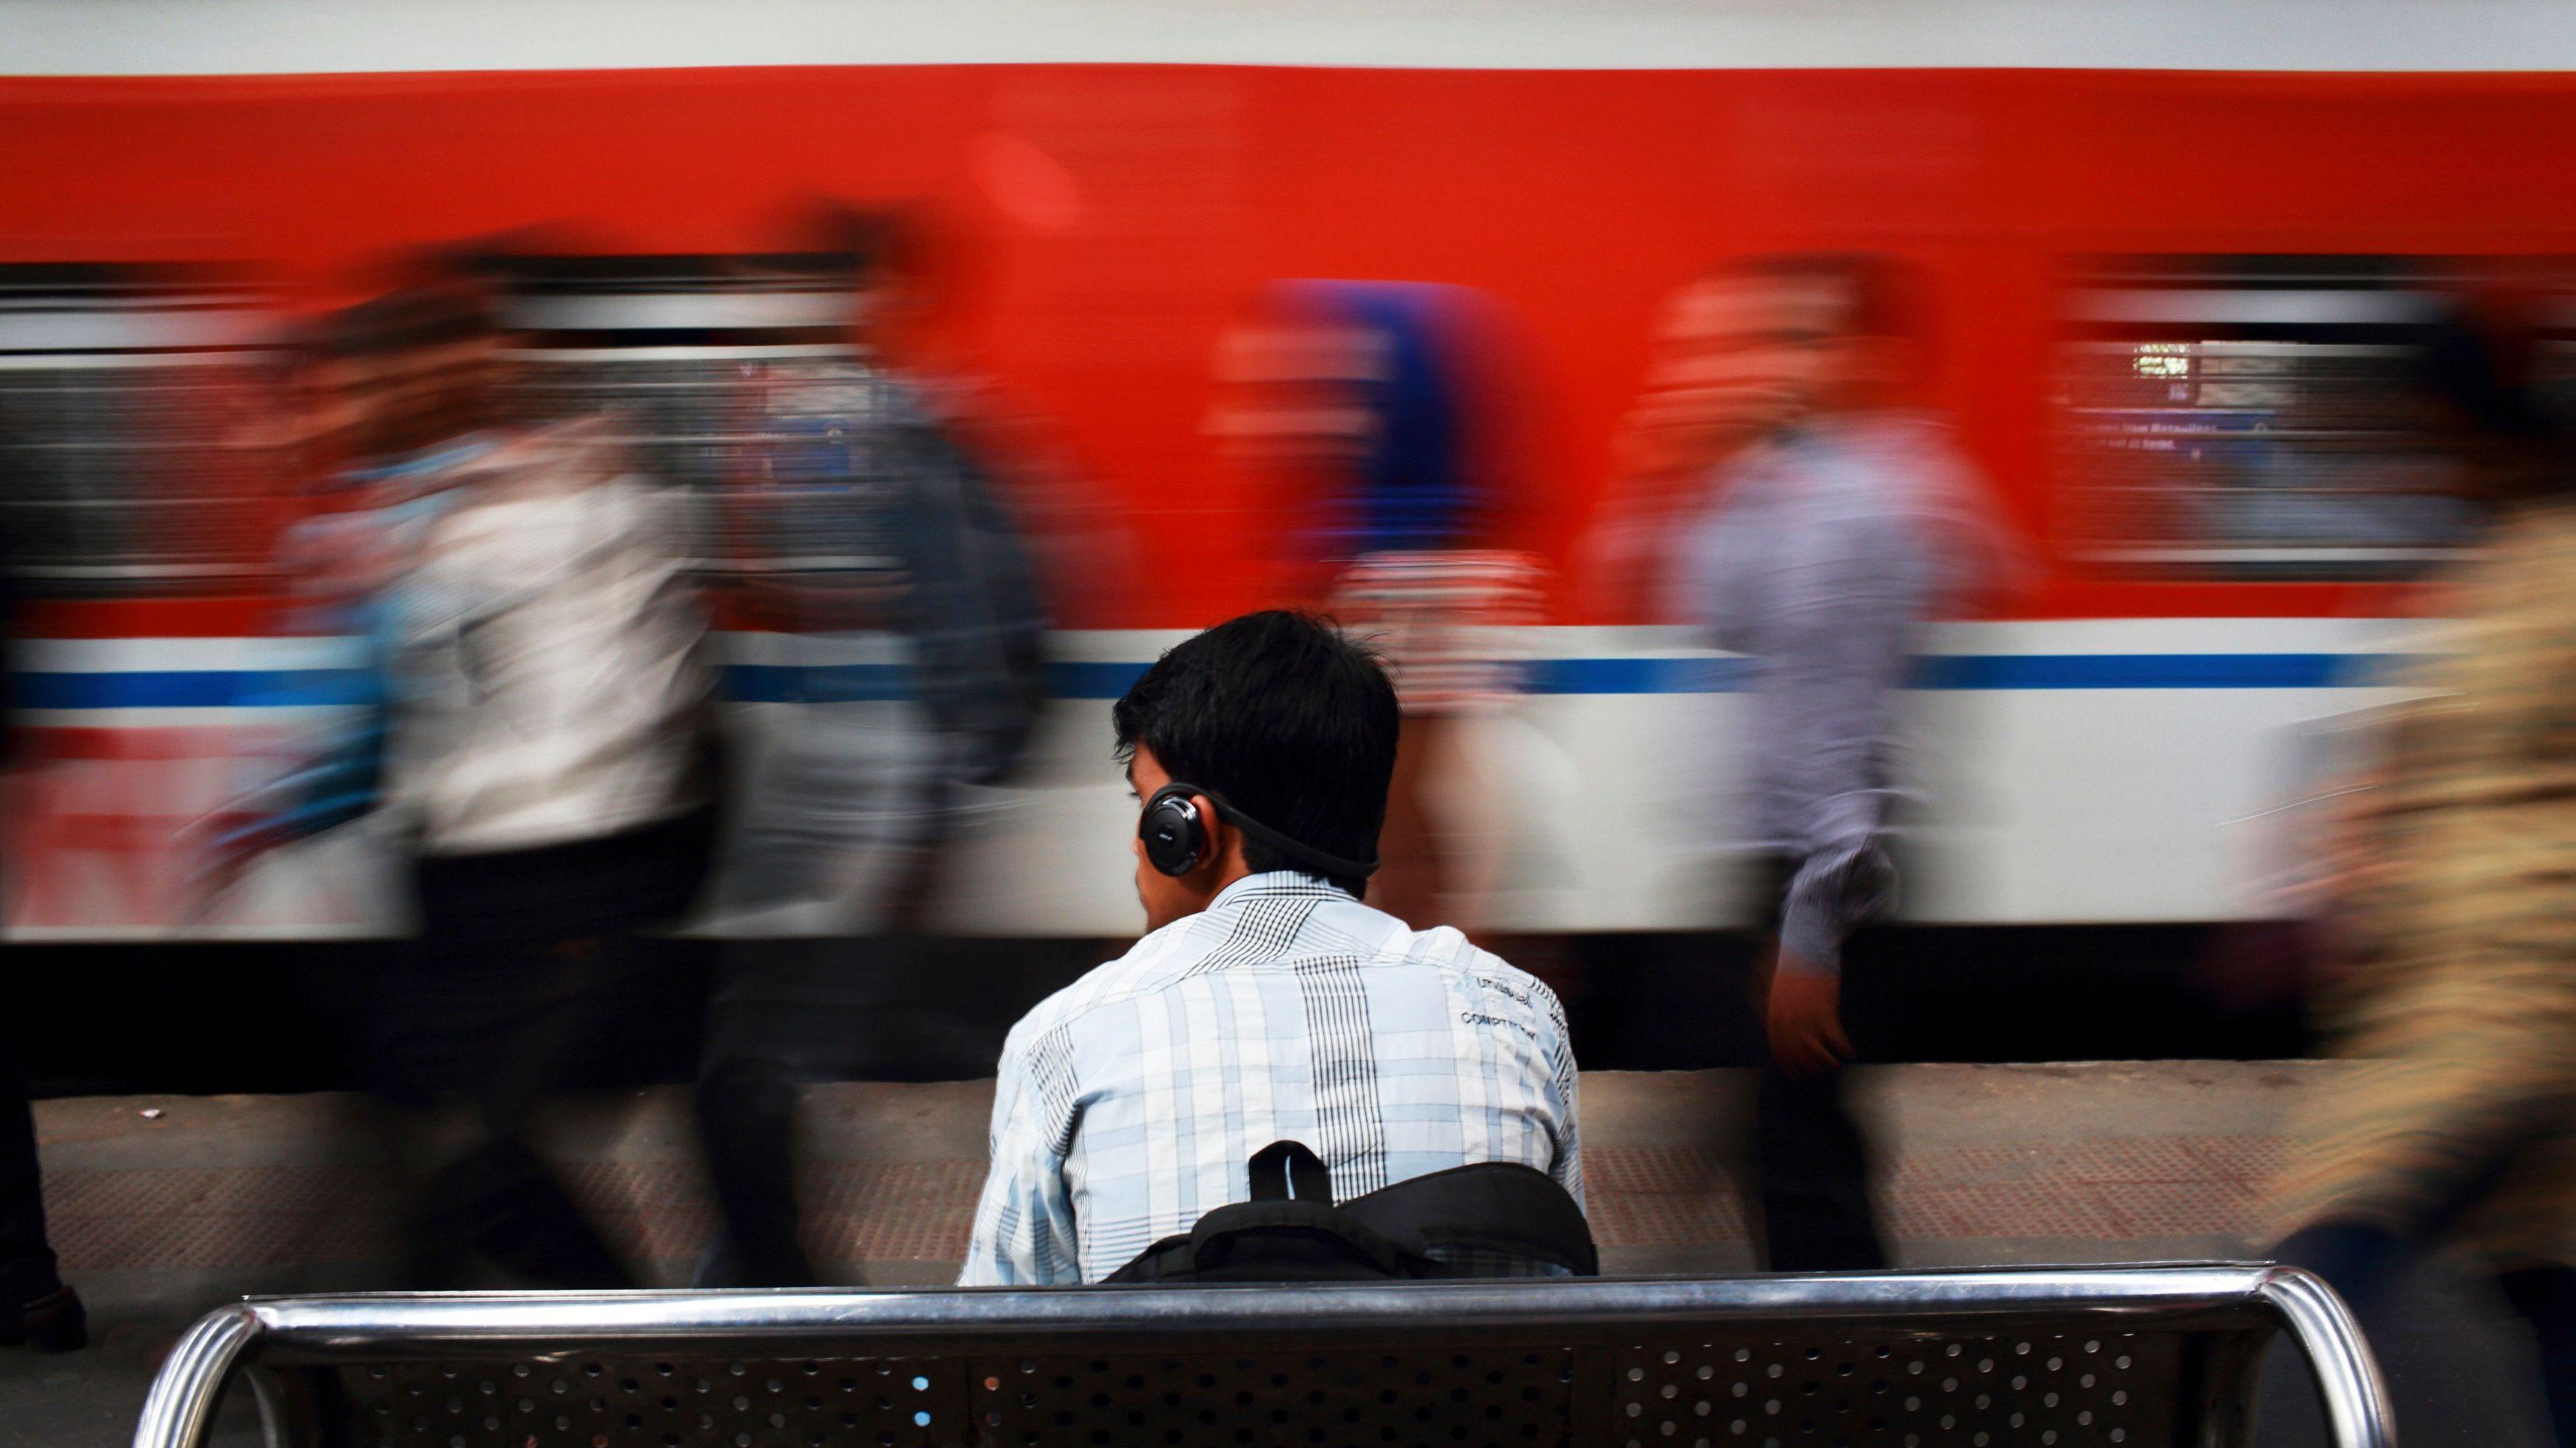 A man listens to music as he waits for his train at Churchgate railway station in Mumbai